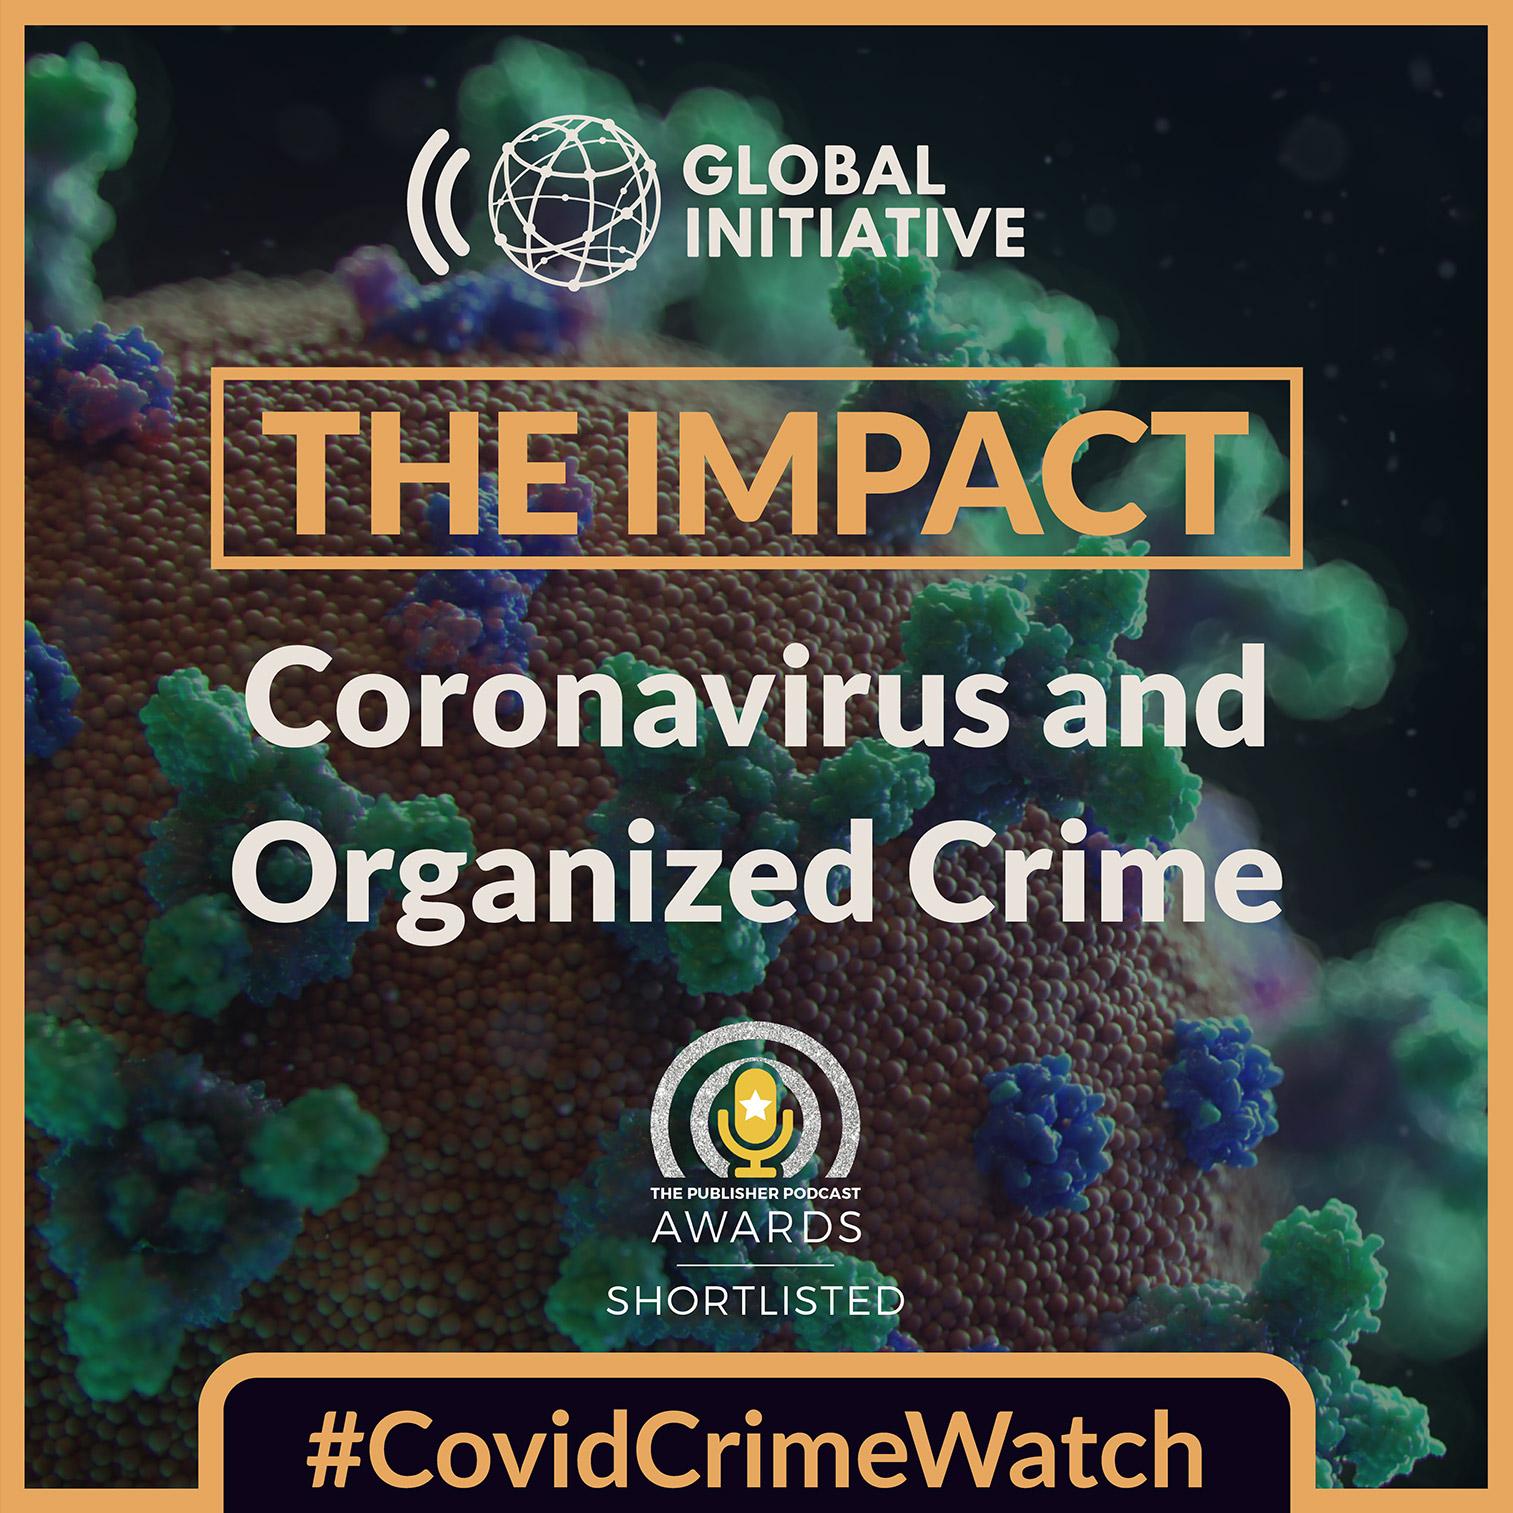 Artwork for podcast The Impact: Coronavirus and Organized Crime